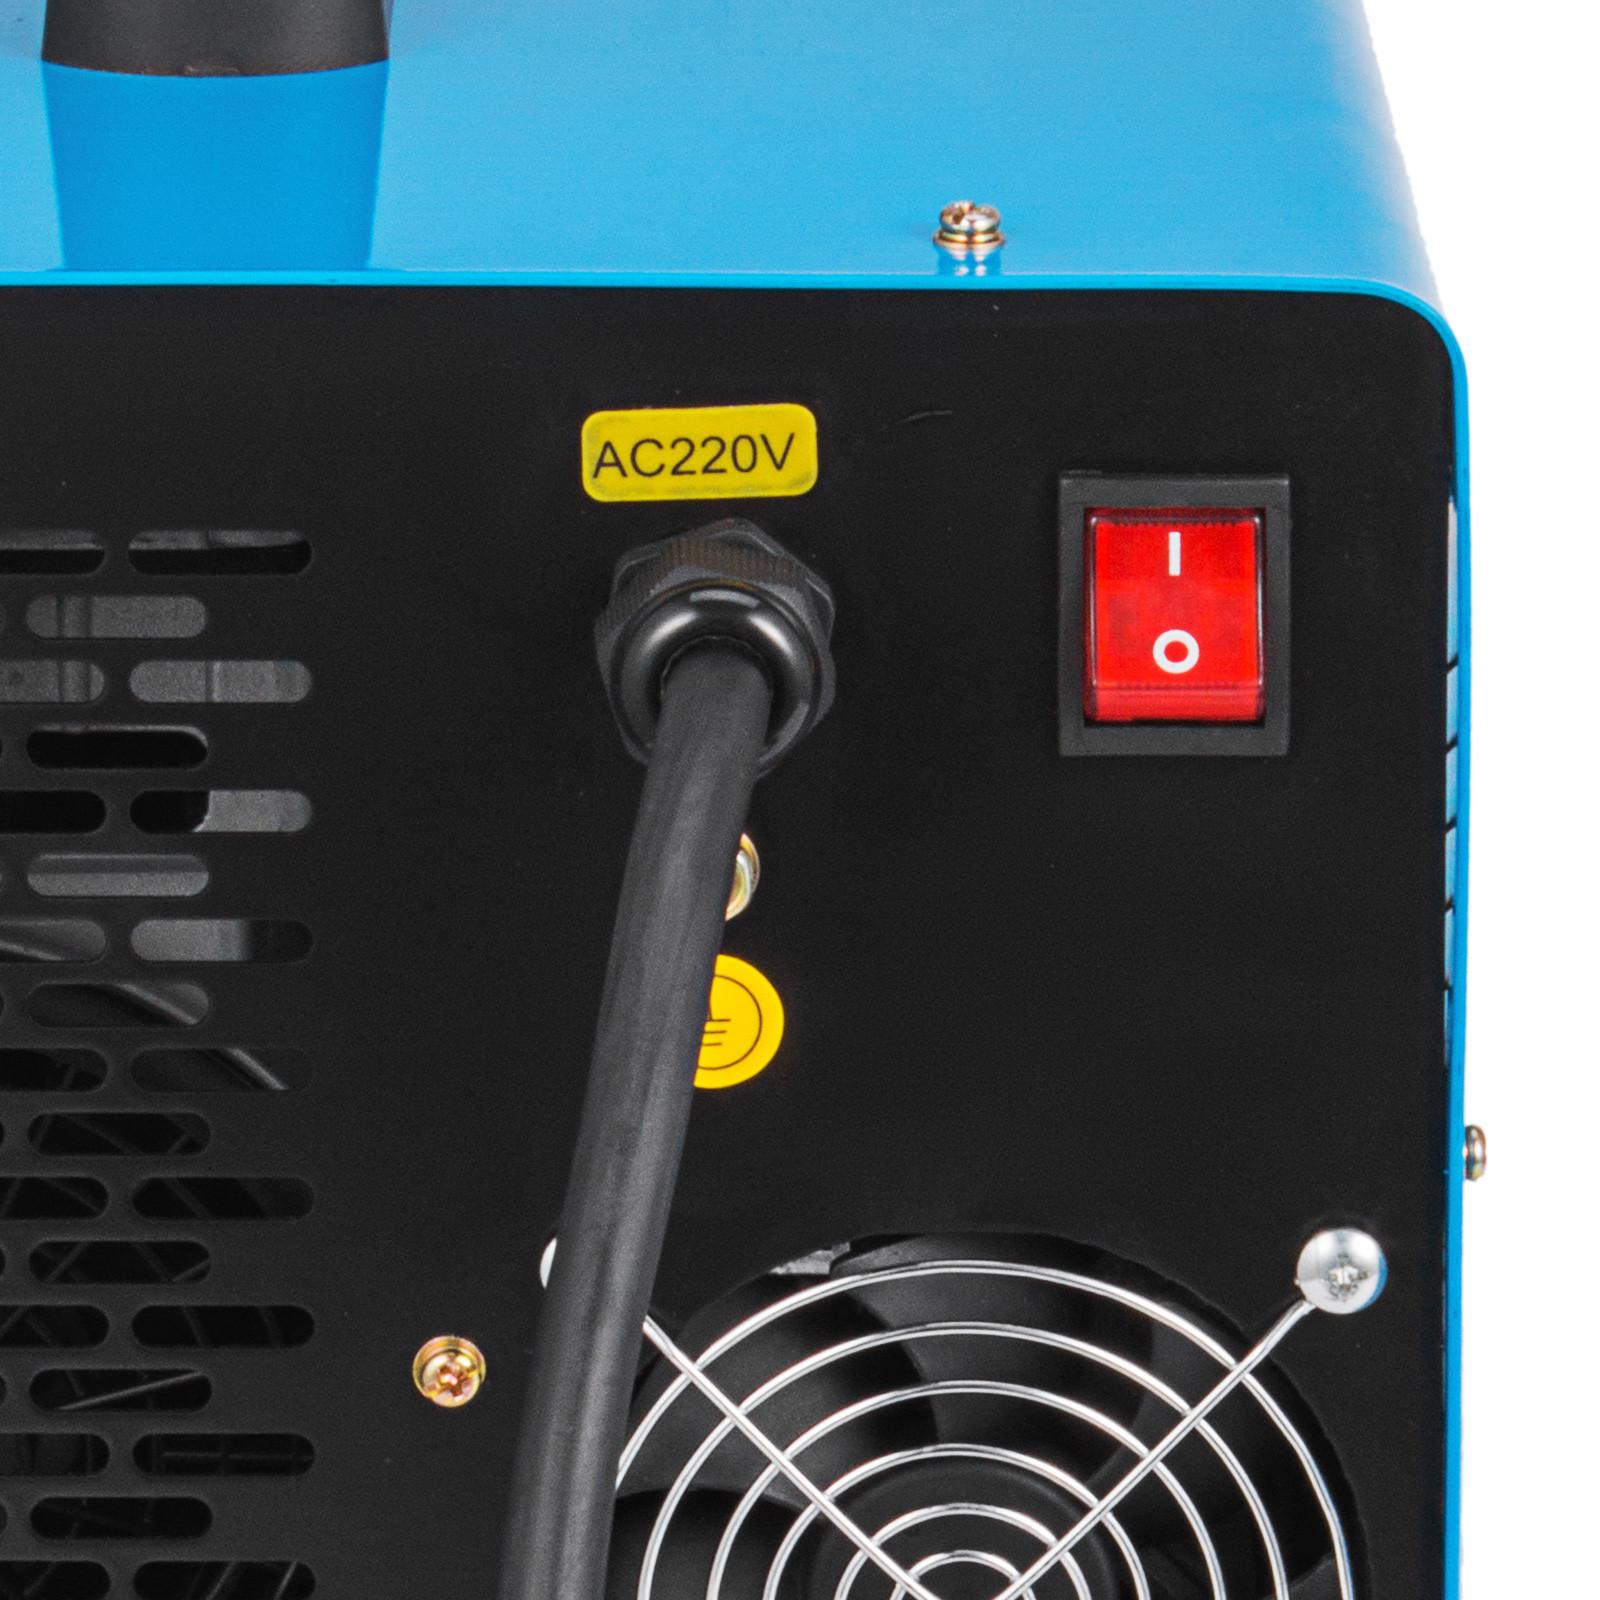 40-85A-Plasma-Cutter-Built-In-Air-Compressor-Inverter-Cutting-Machine-Cut-35mm thumbnail 21